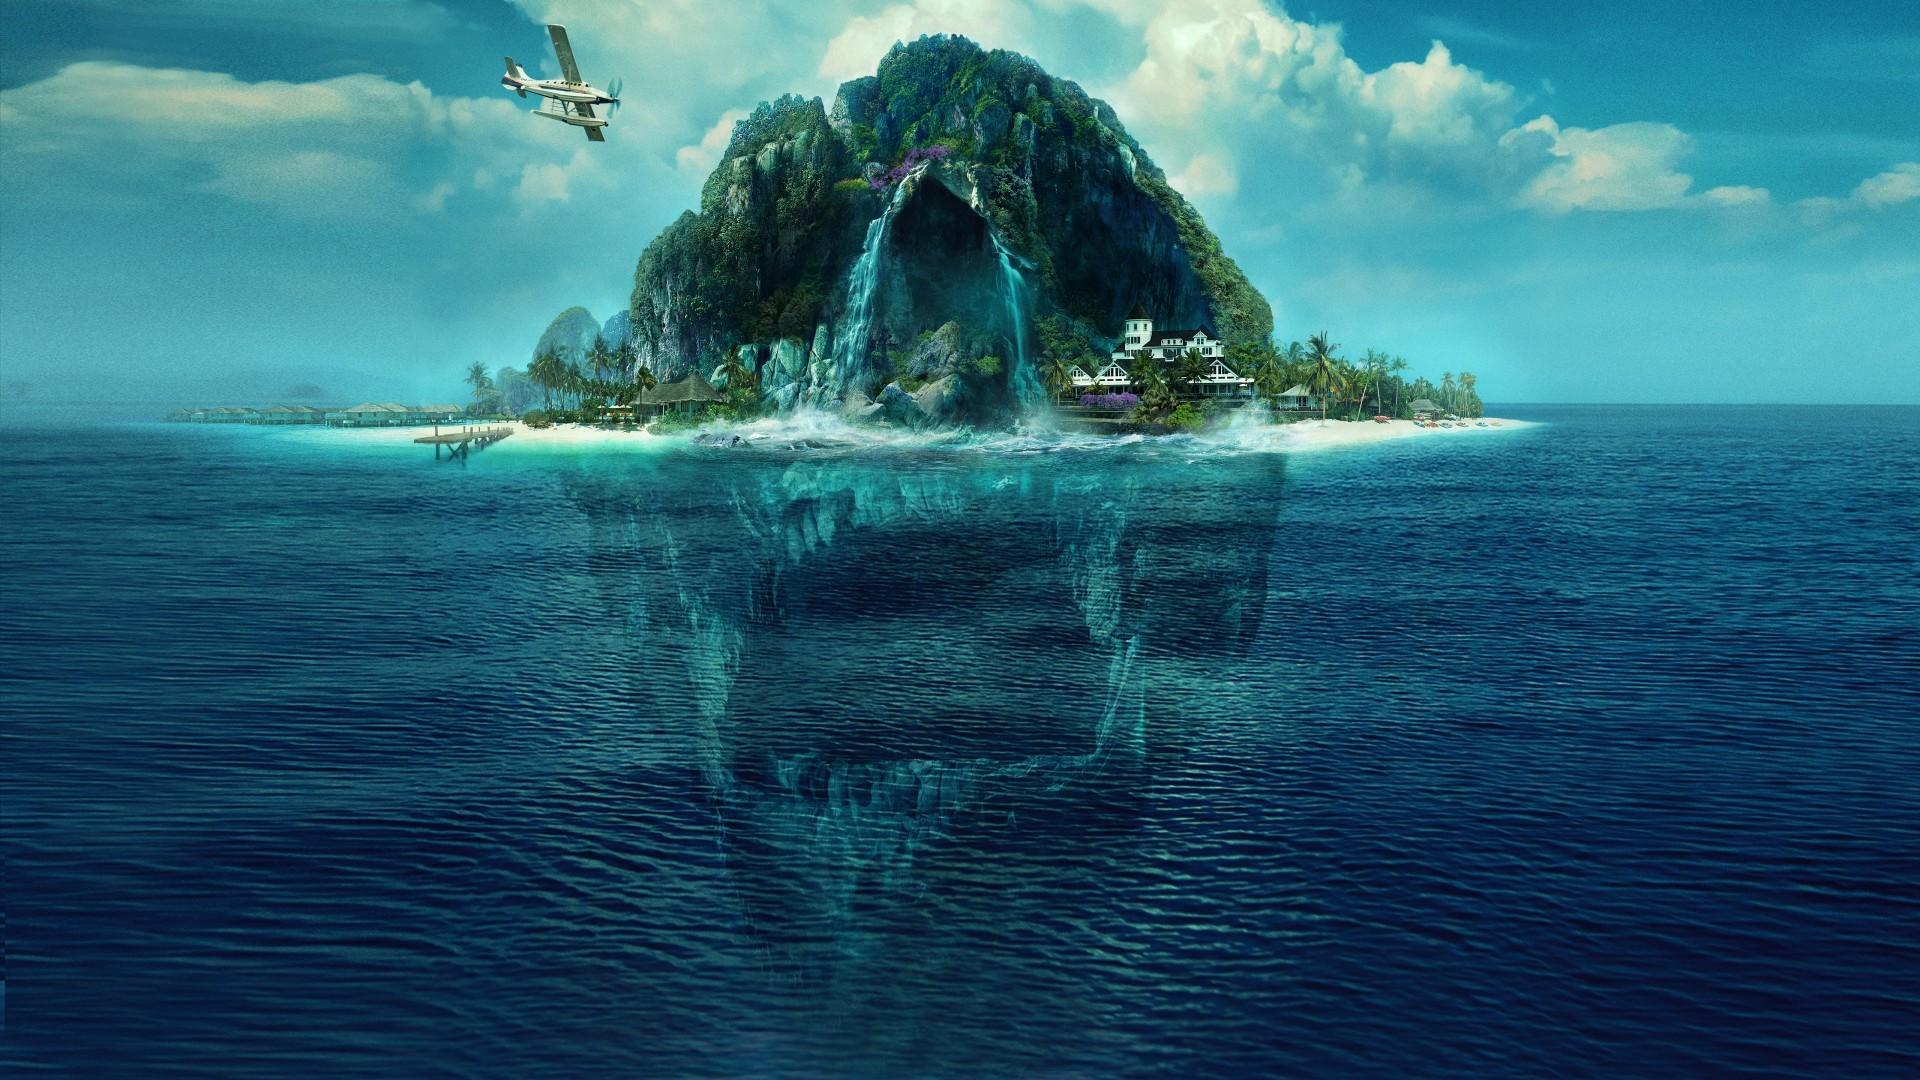 Download 1920x1080 Fantasy Island 2020 Fantastic Movies Ocean 1920x1080